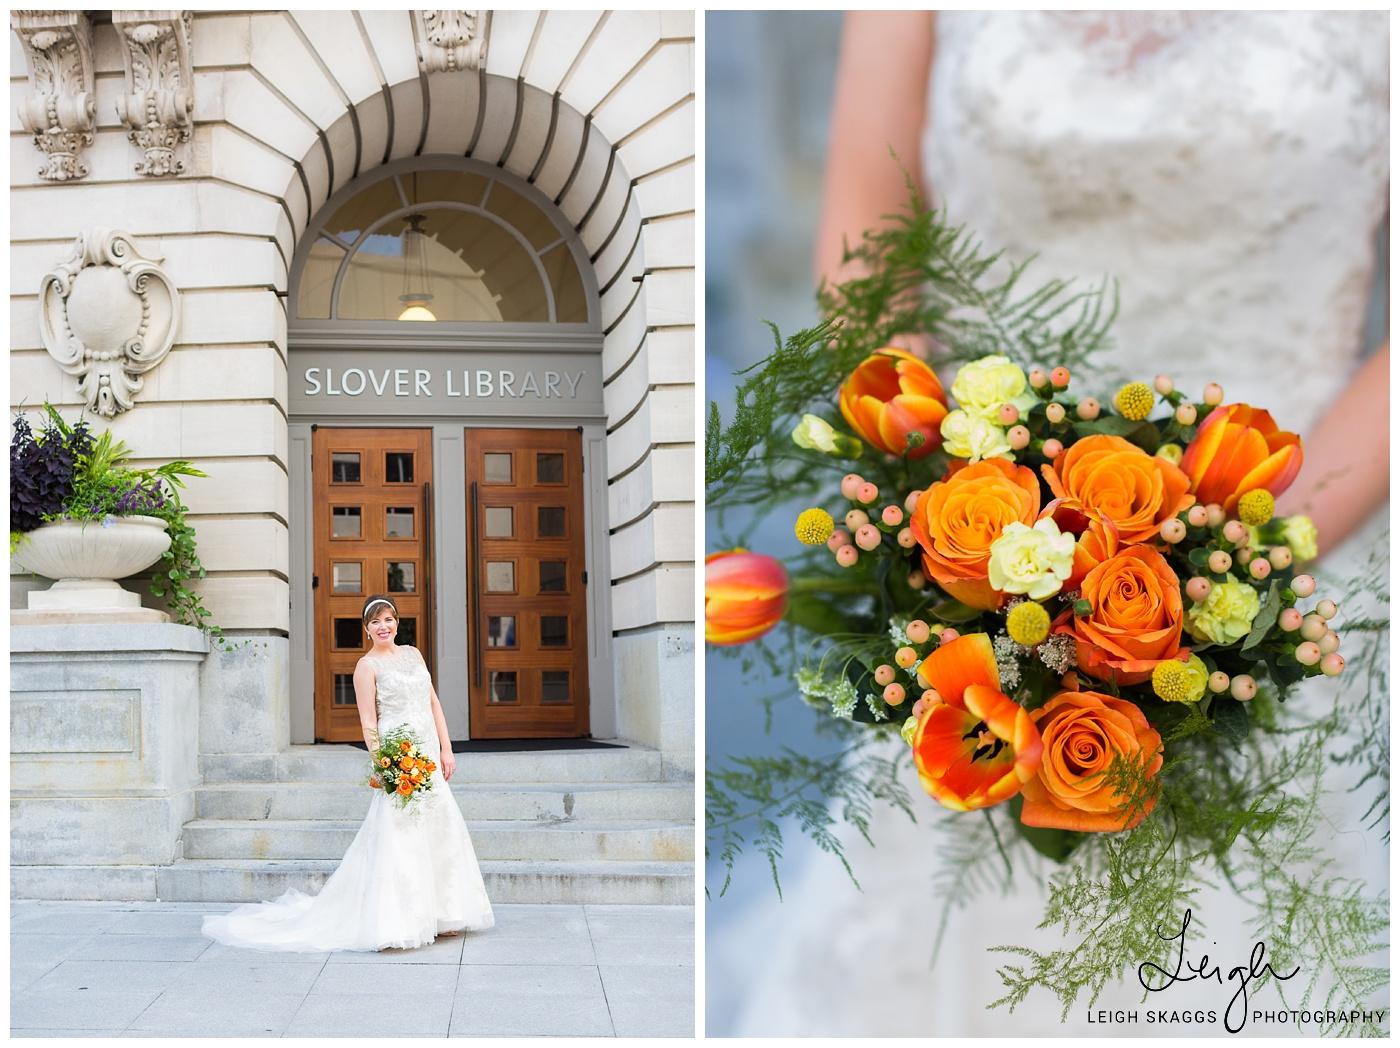 Andi & David   Slover Library Wedding